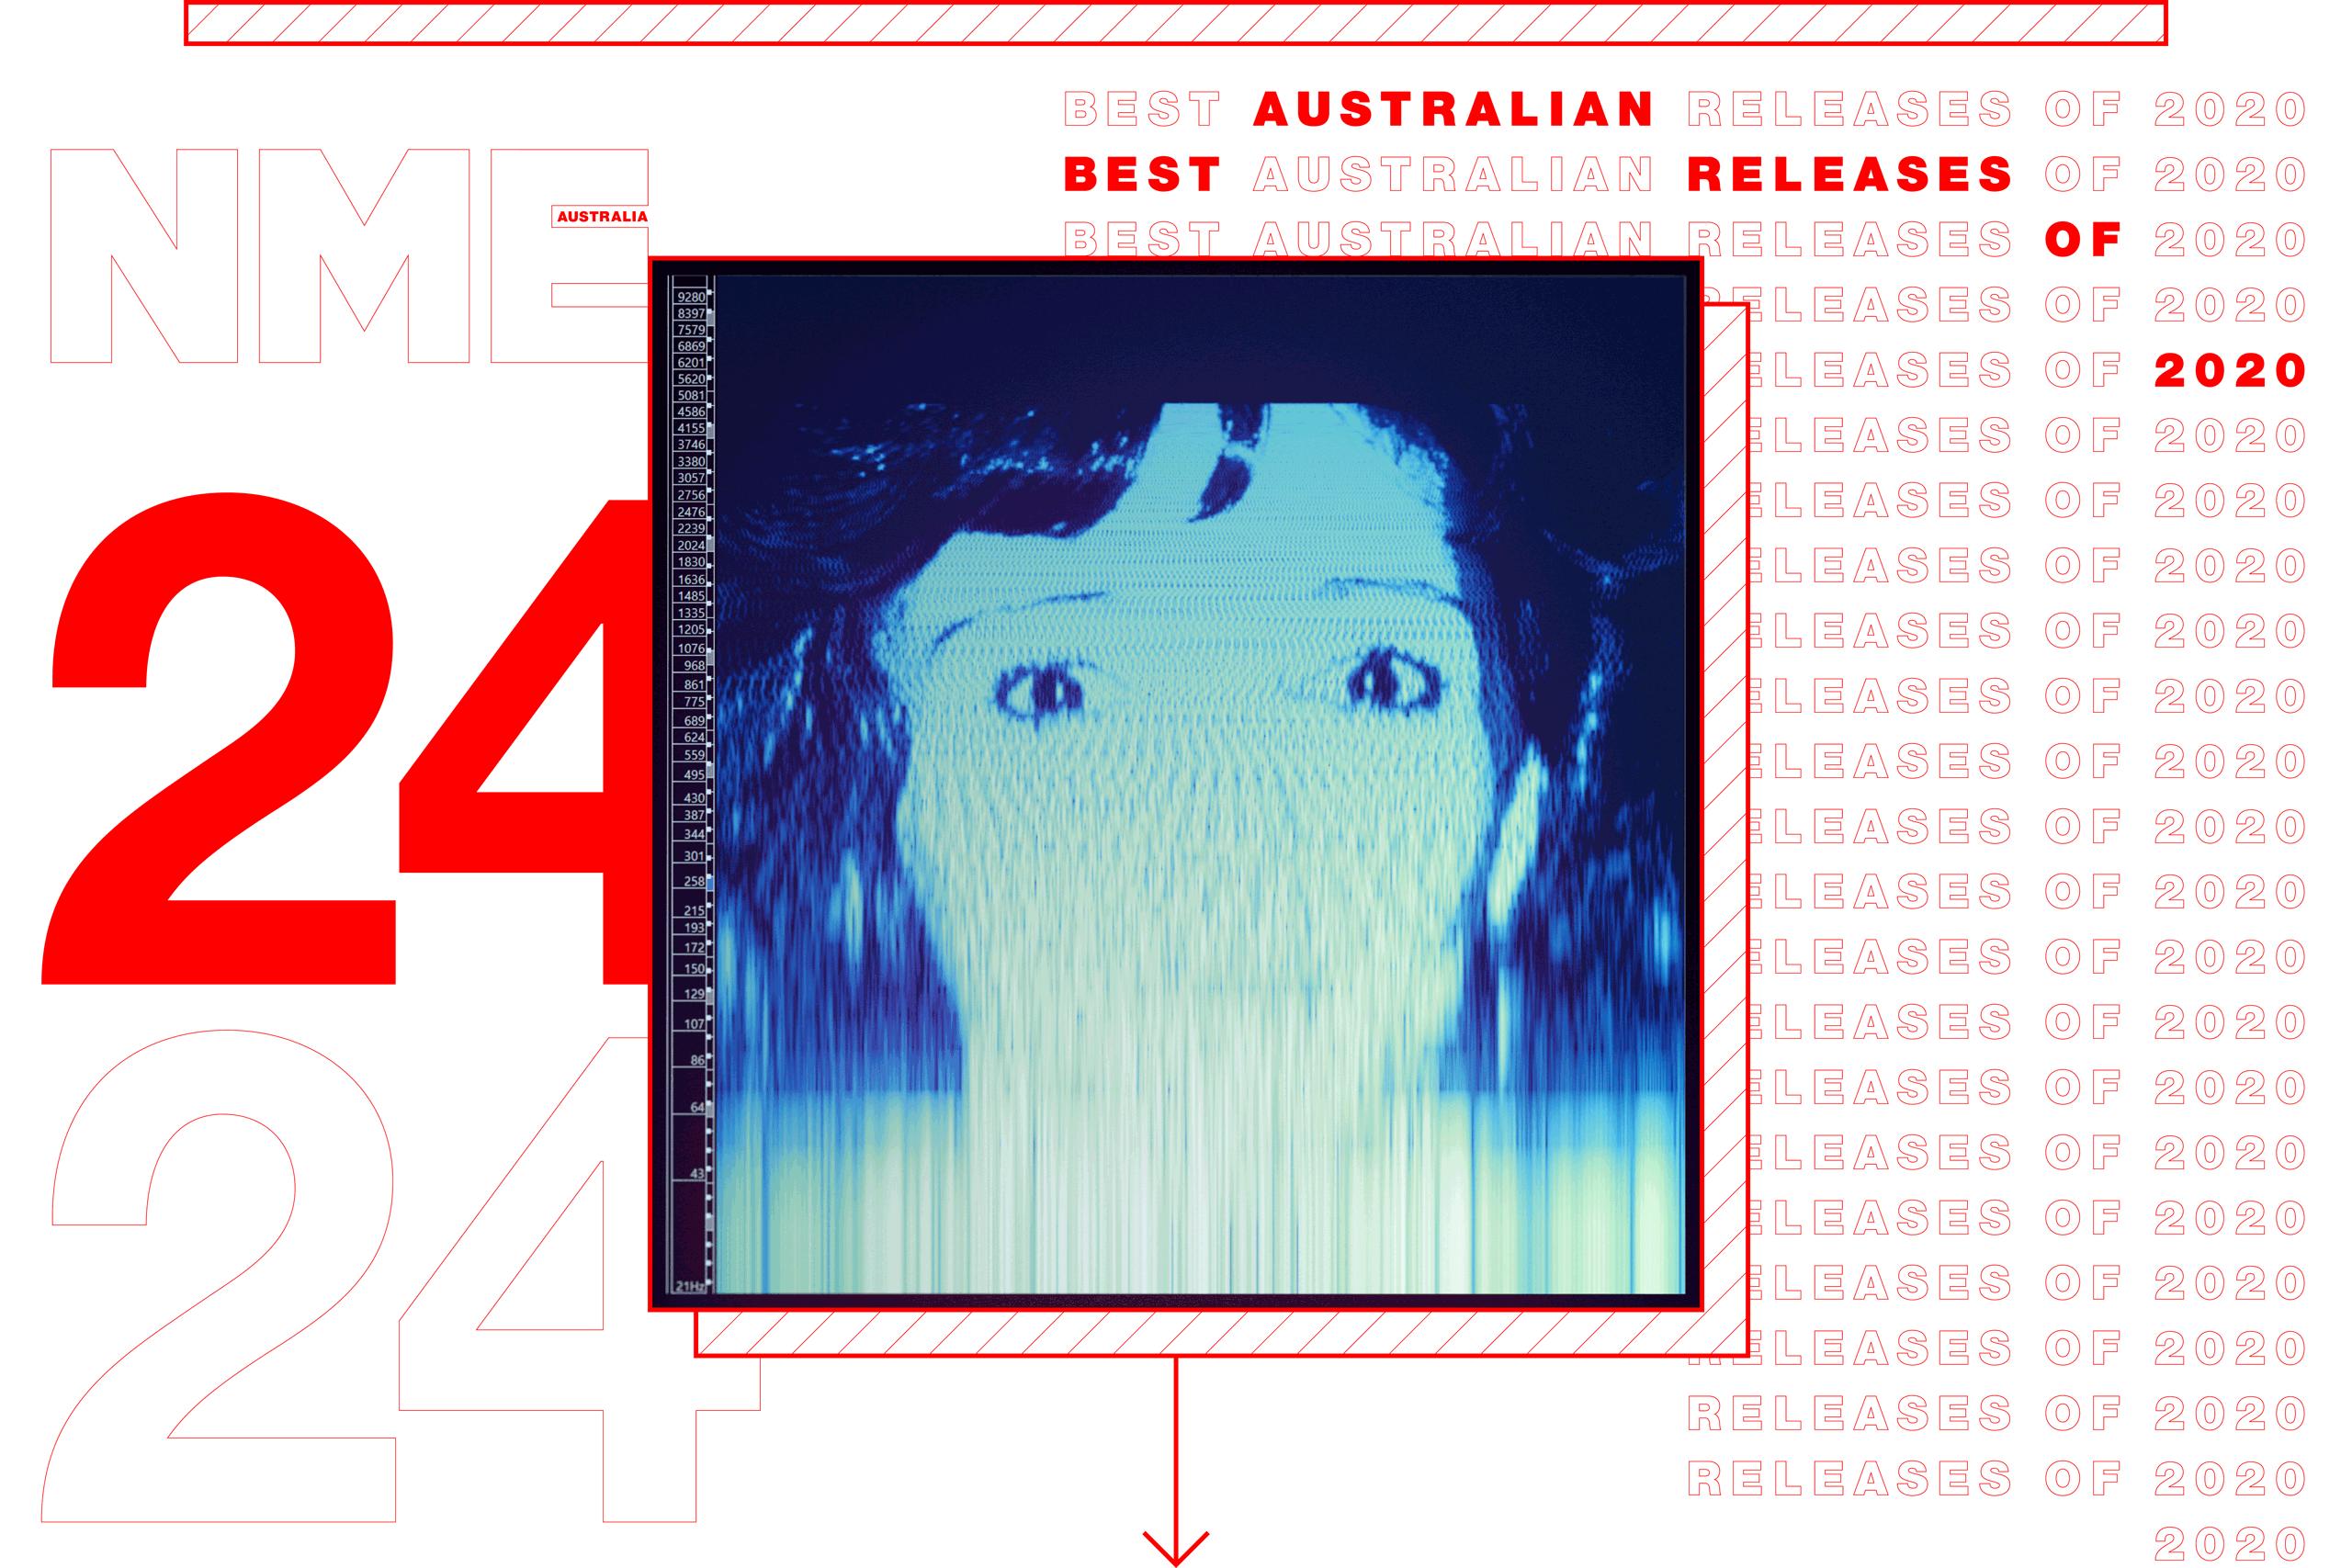 NME Australian Album Release 24